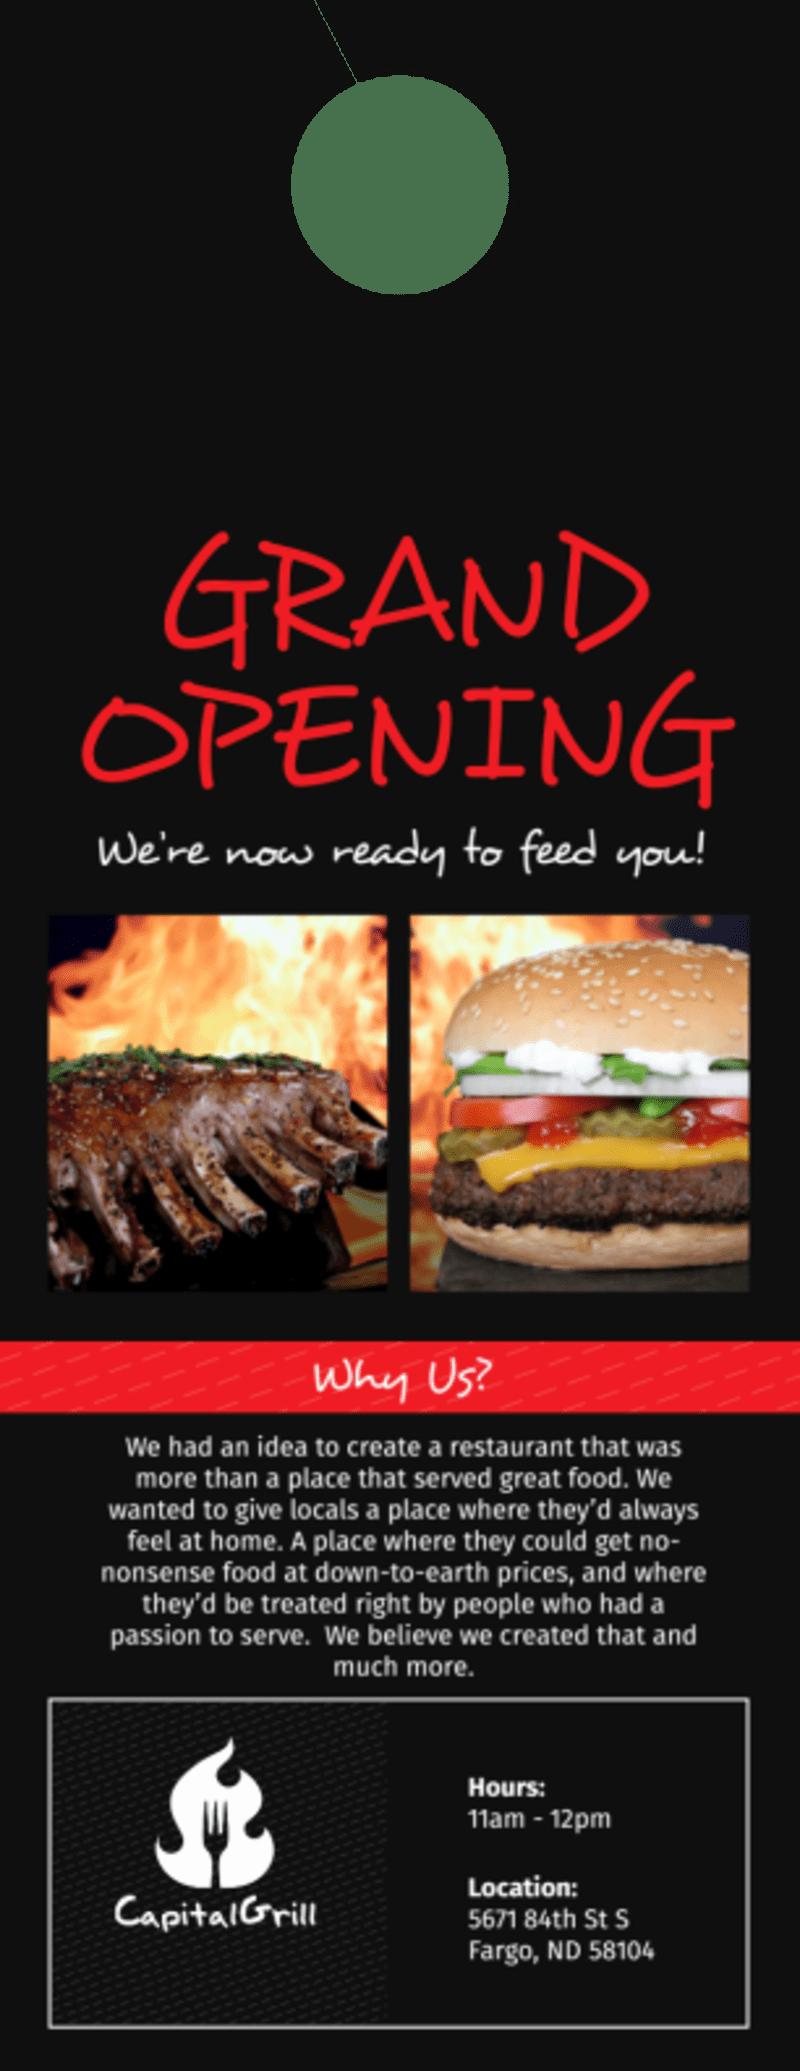 Capital Grill Grand Opening Door Hanger Template Preview 2